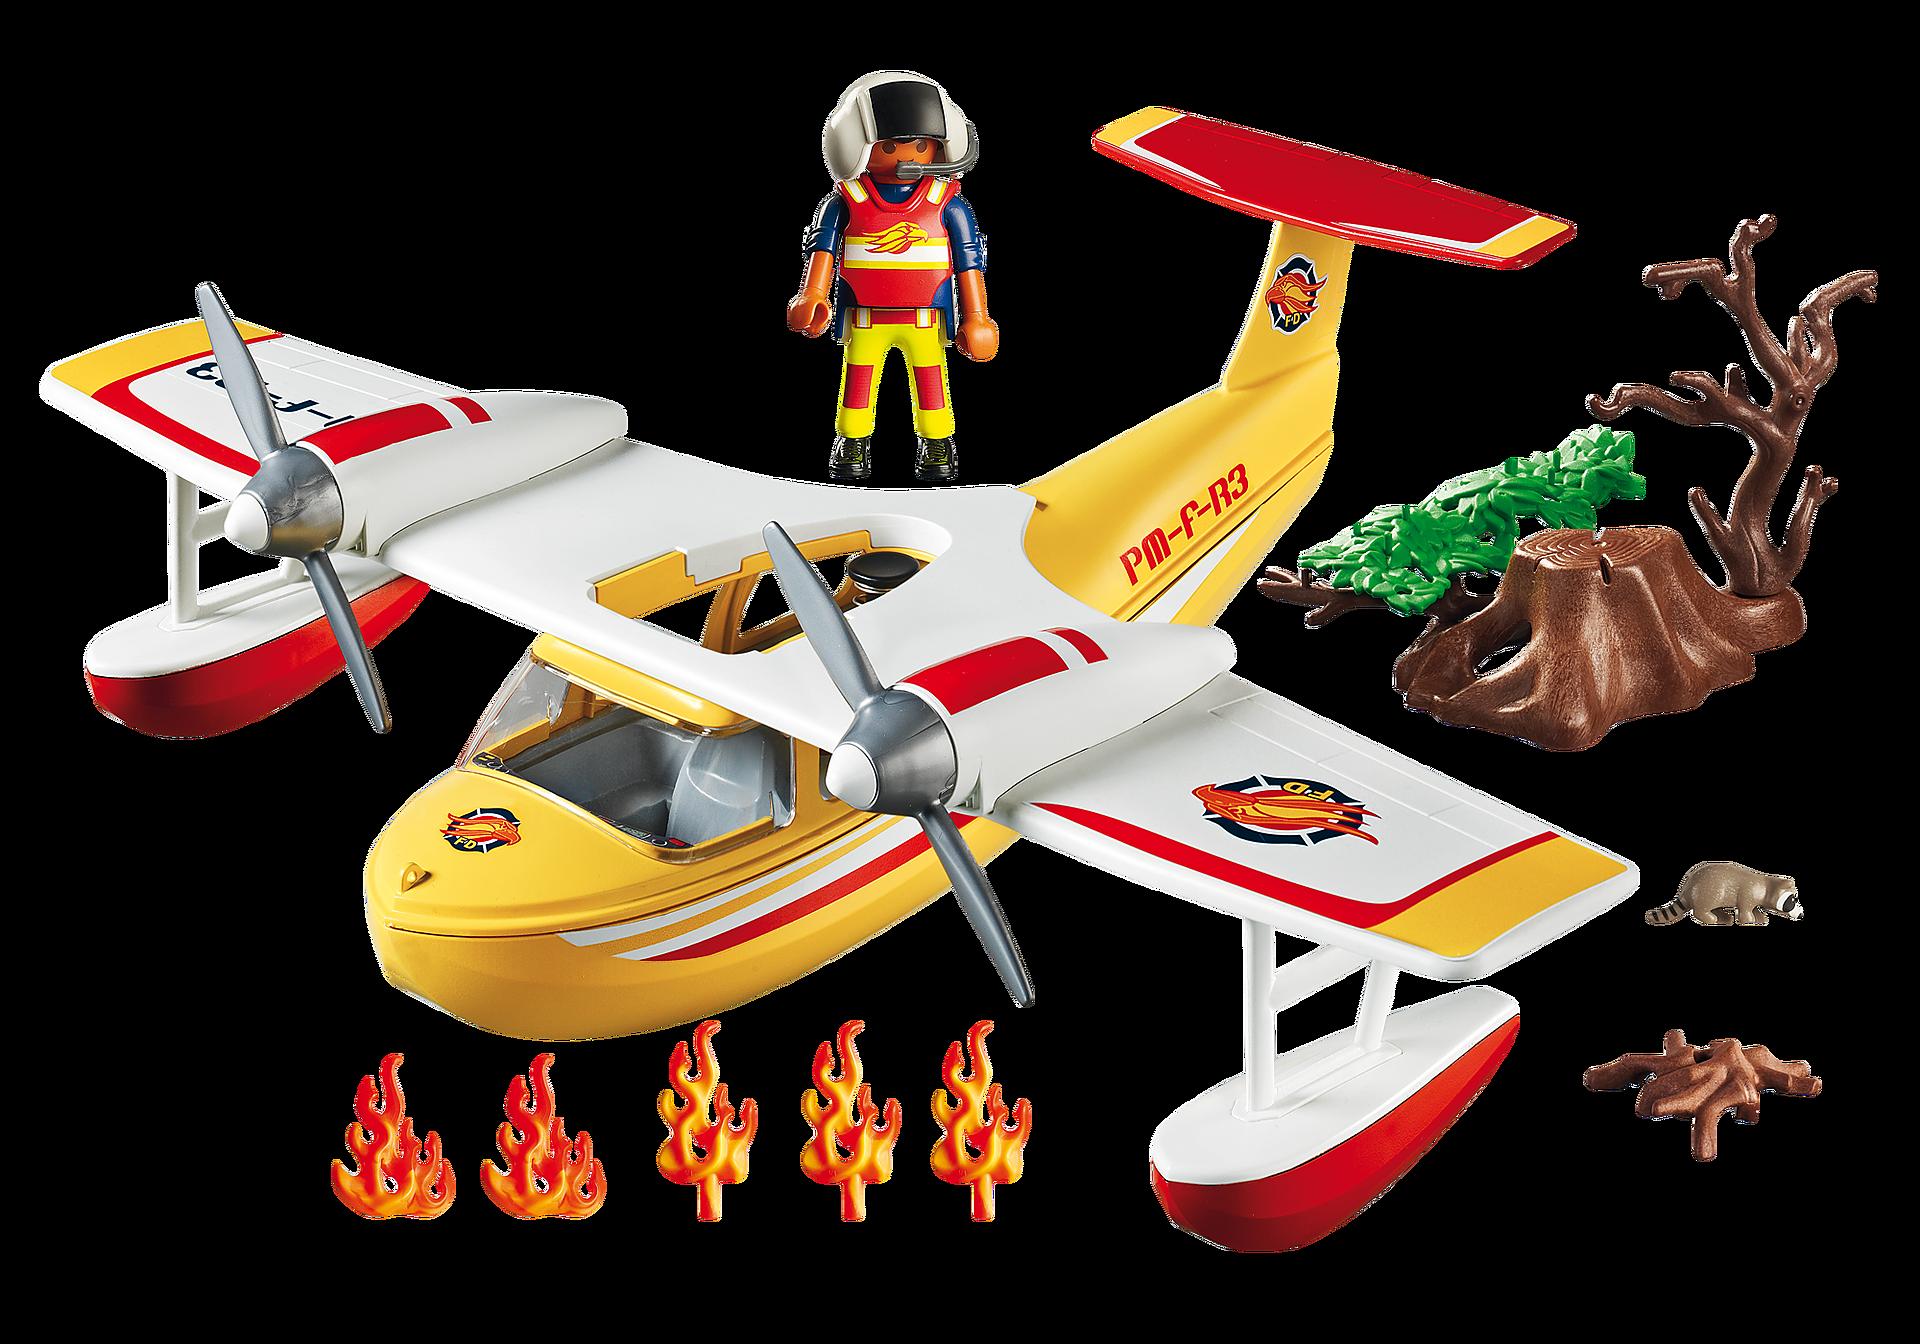 5560 Firefighting Seaplane zoom image4